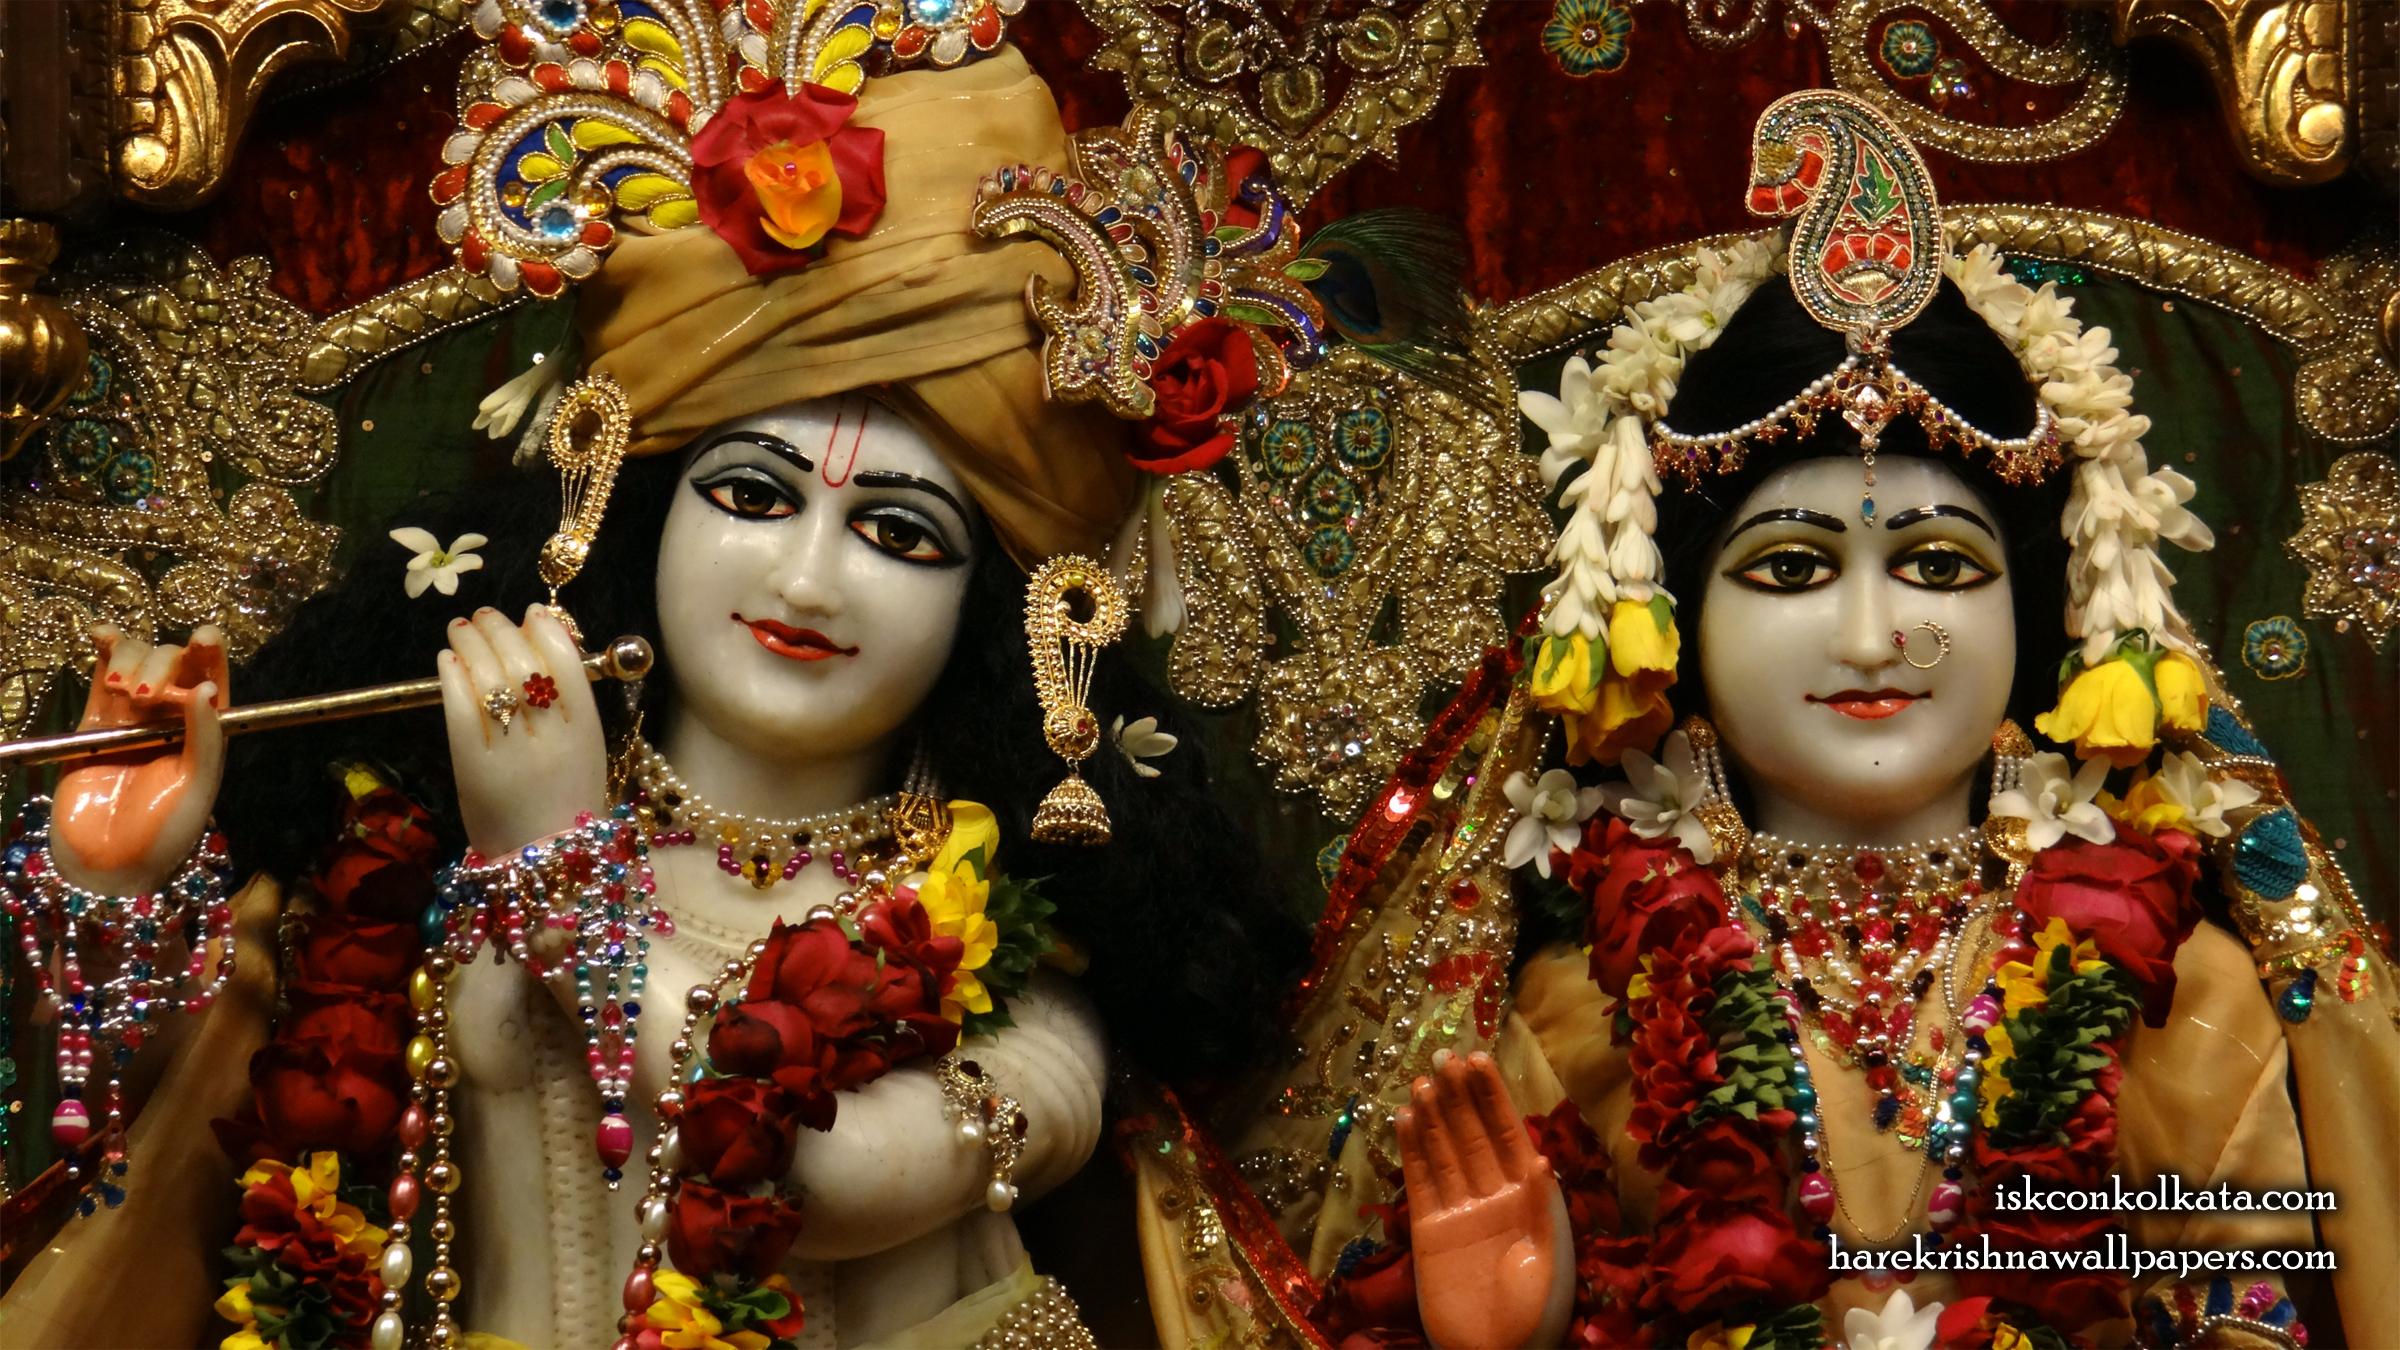 Sri Sri Radha Govinda Close up Wallpaper (009) Size 2400x1350 Download